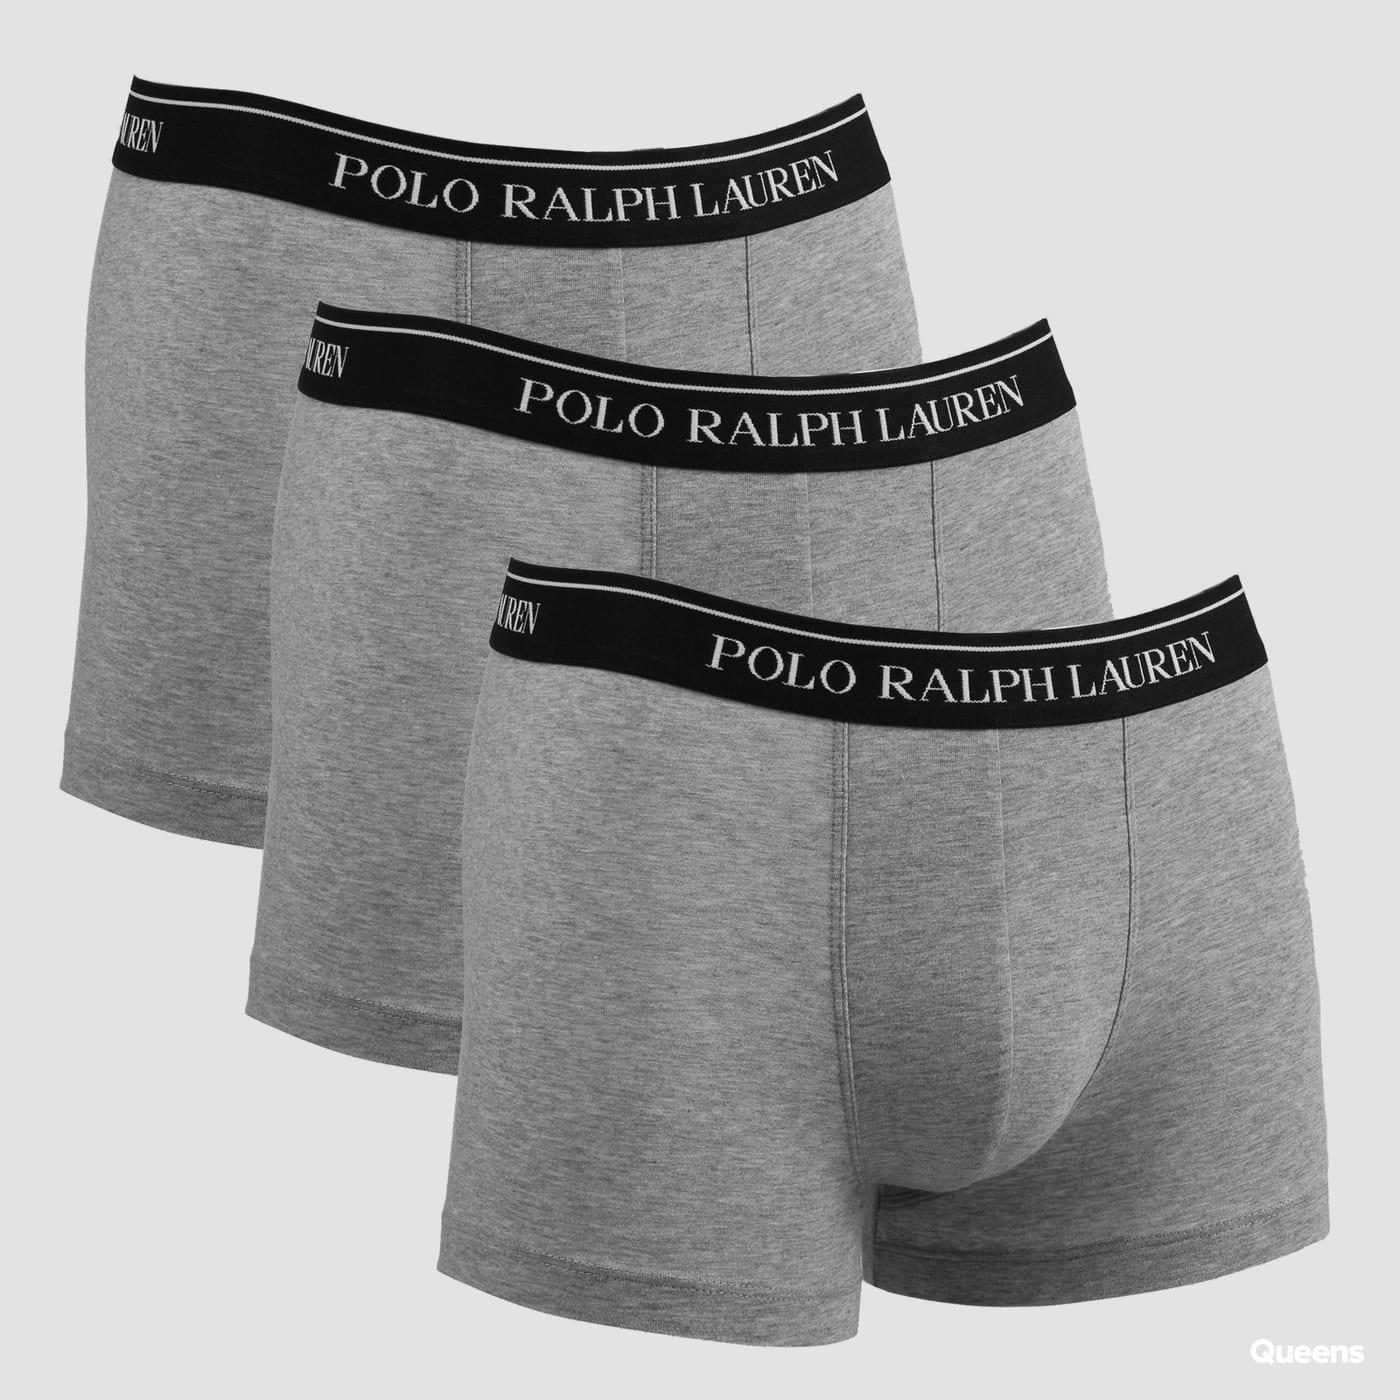 Polo Ralph Lauren 3 Pack Classic Trunks C/O grau melange